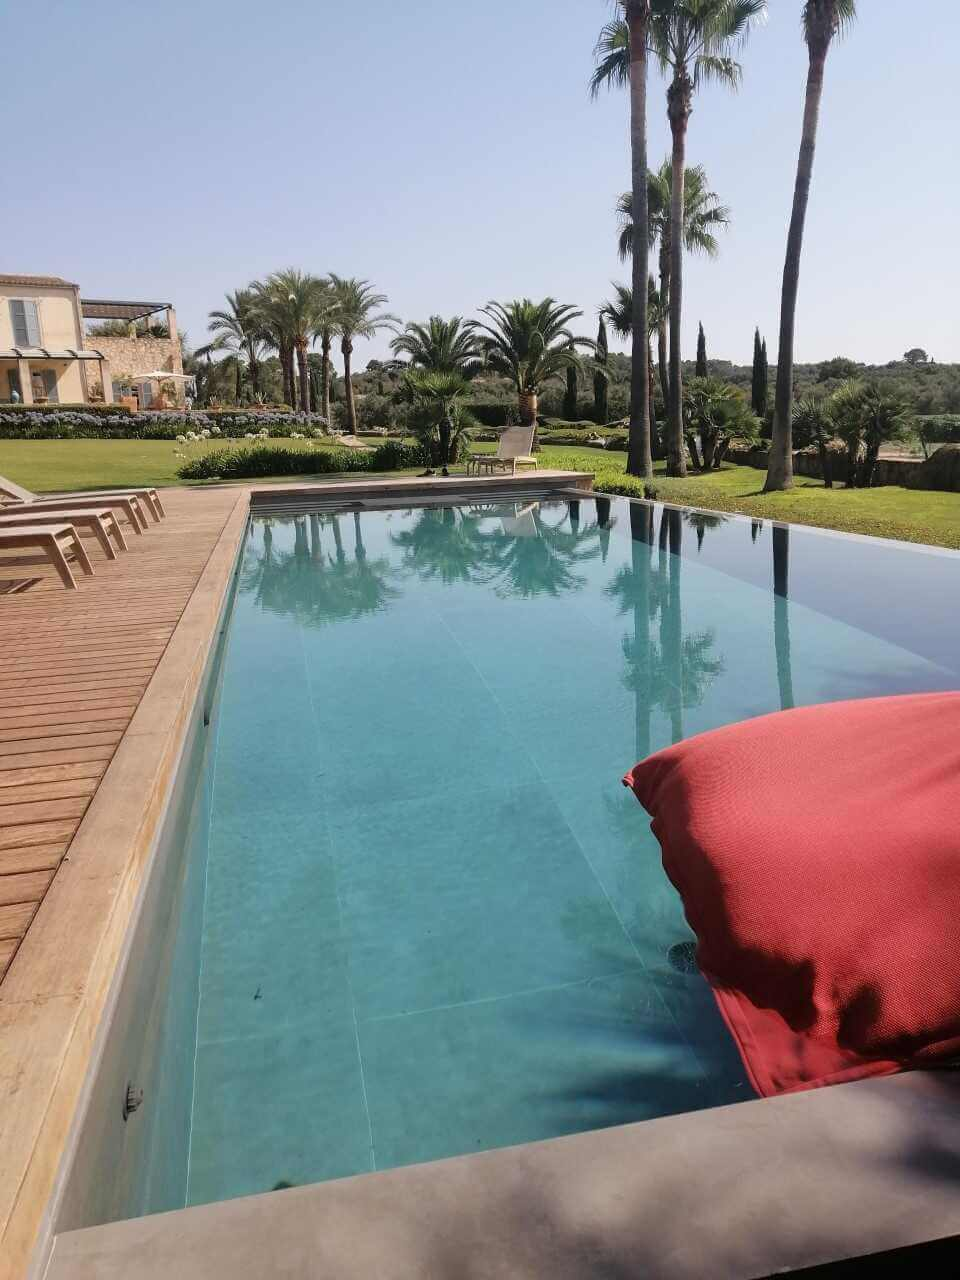 Thumbnail Img 20200724 105635 | Vivienda Unifamiliar Ibiza, España